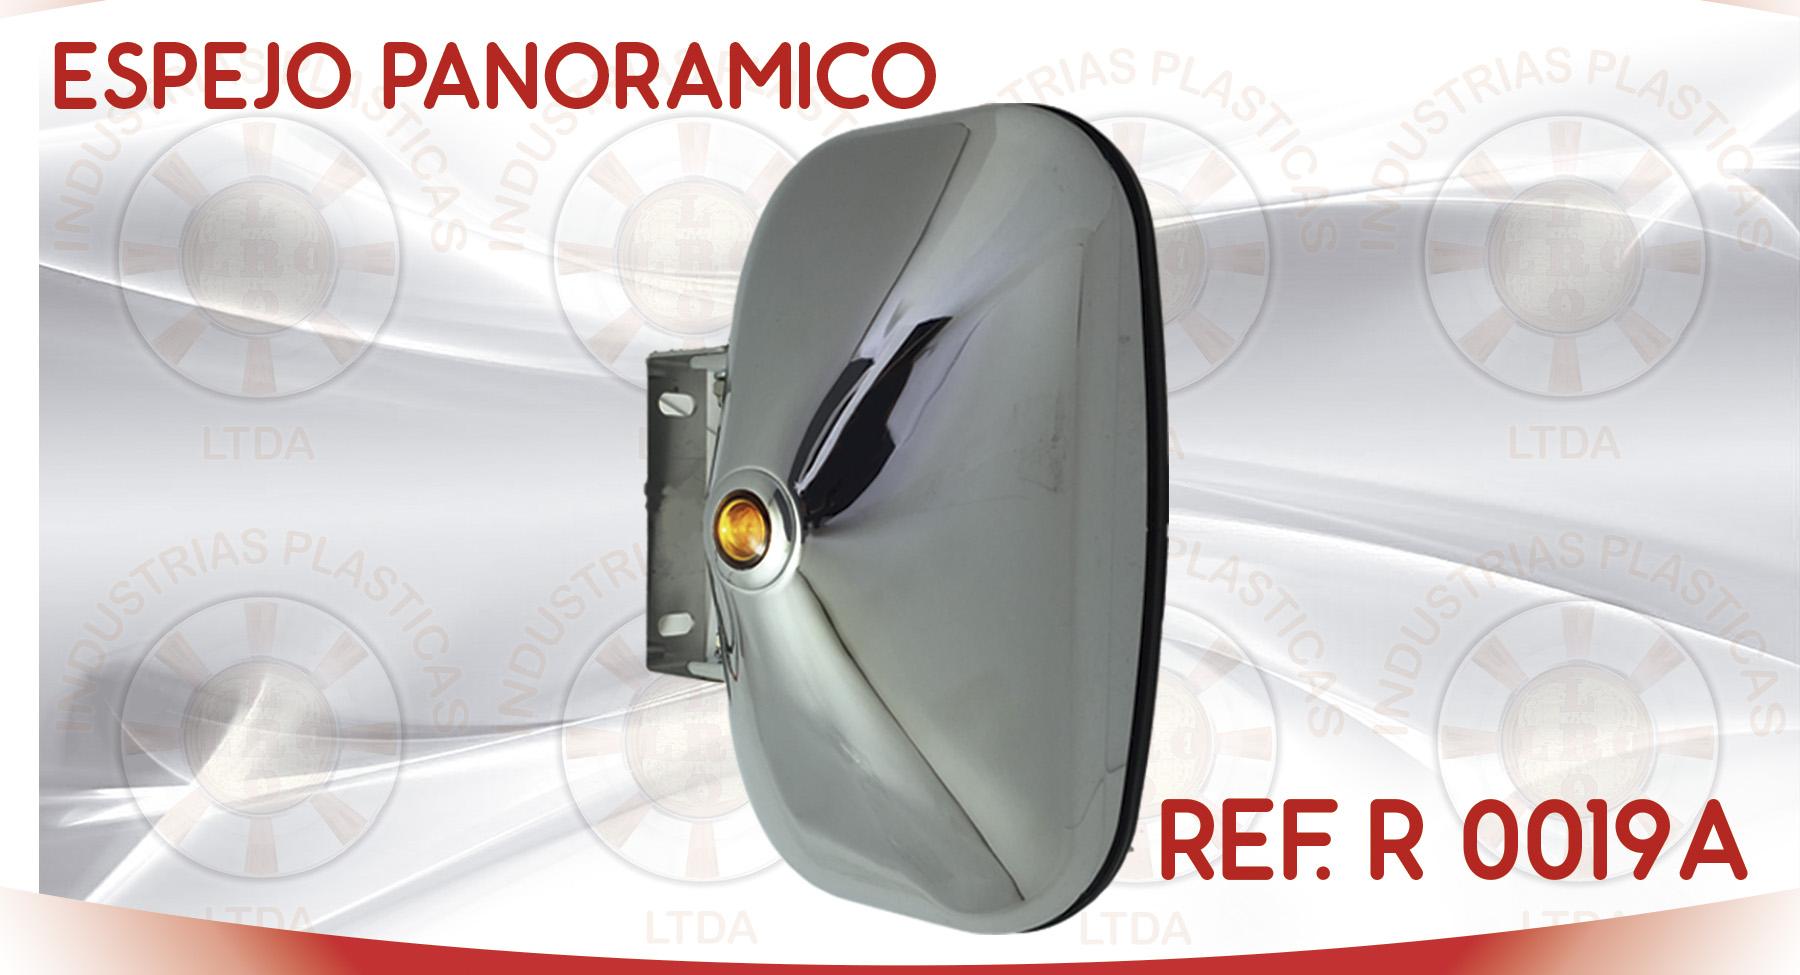 R 0019A ESPEJO PANORAMICO